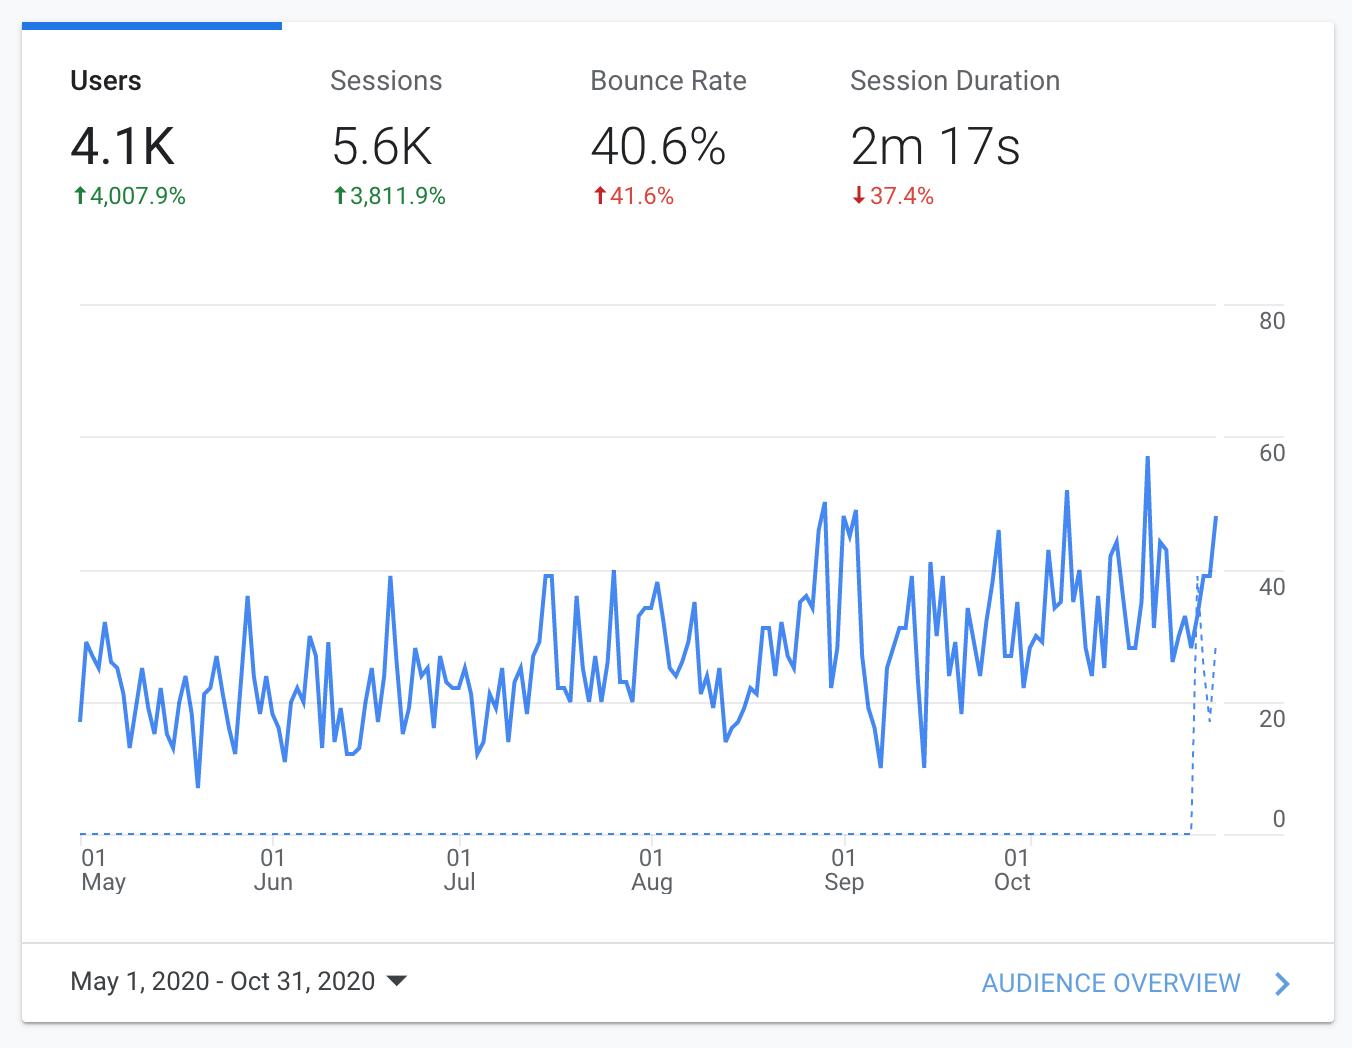 Digital marketing agency analytics results for the Gras CBD company